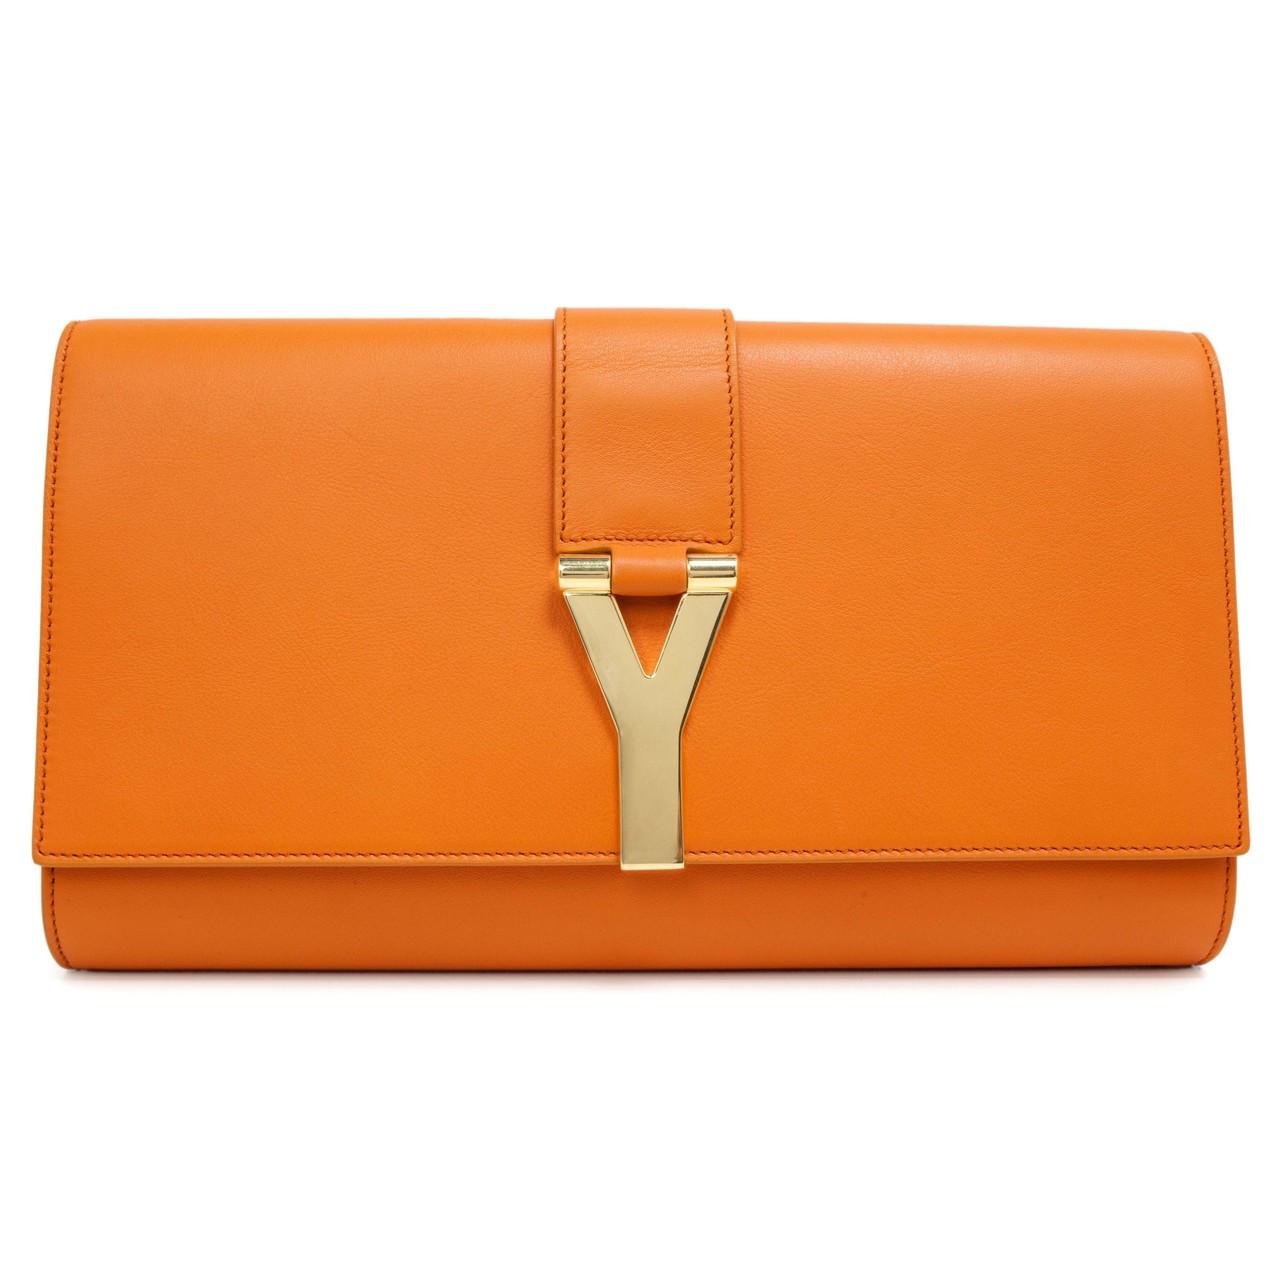 f00035df9bb4d Yves Saint Laurent Orange Calfskin Classic Y Ligne Clutch - modaselle